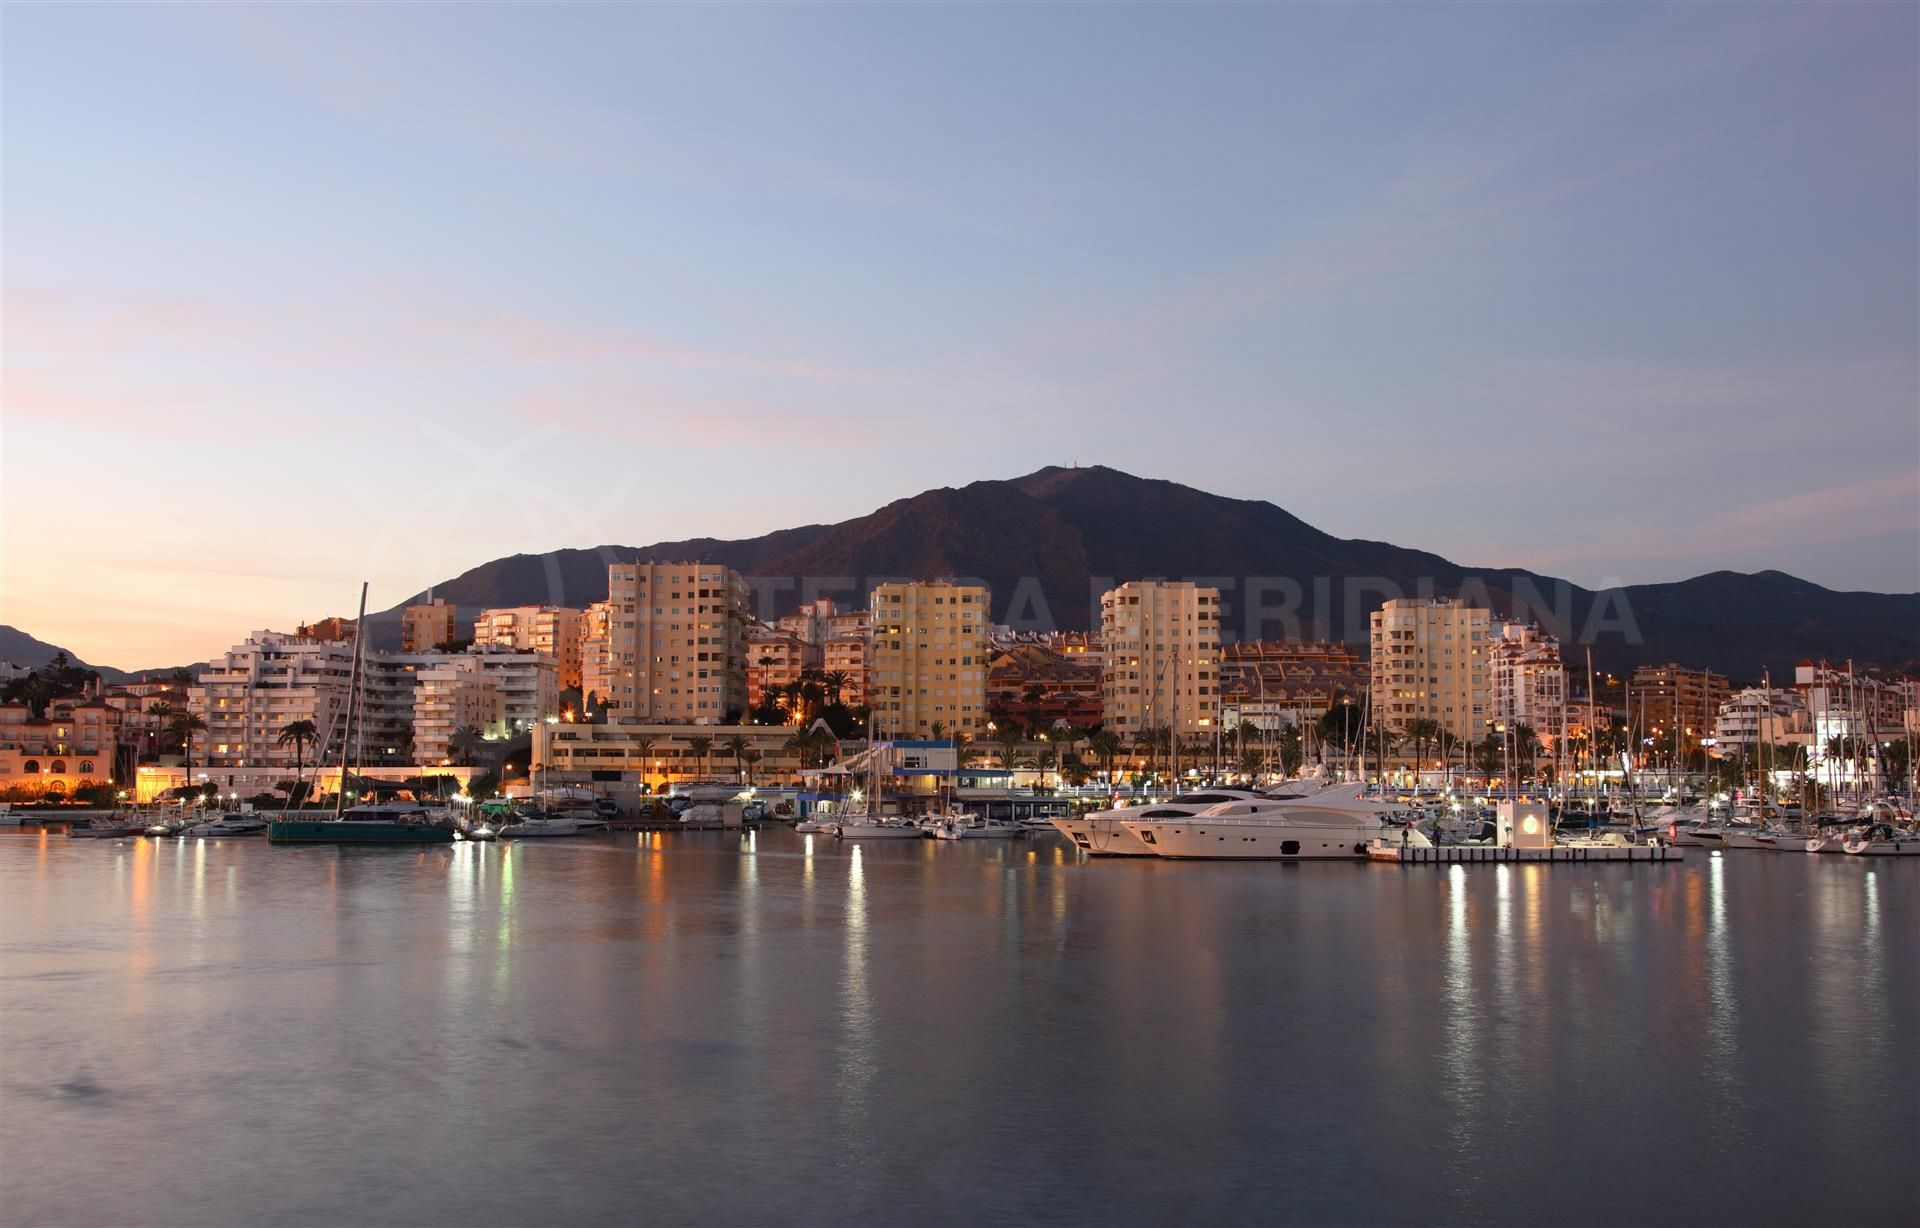 Estepona port and marina